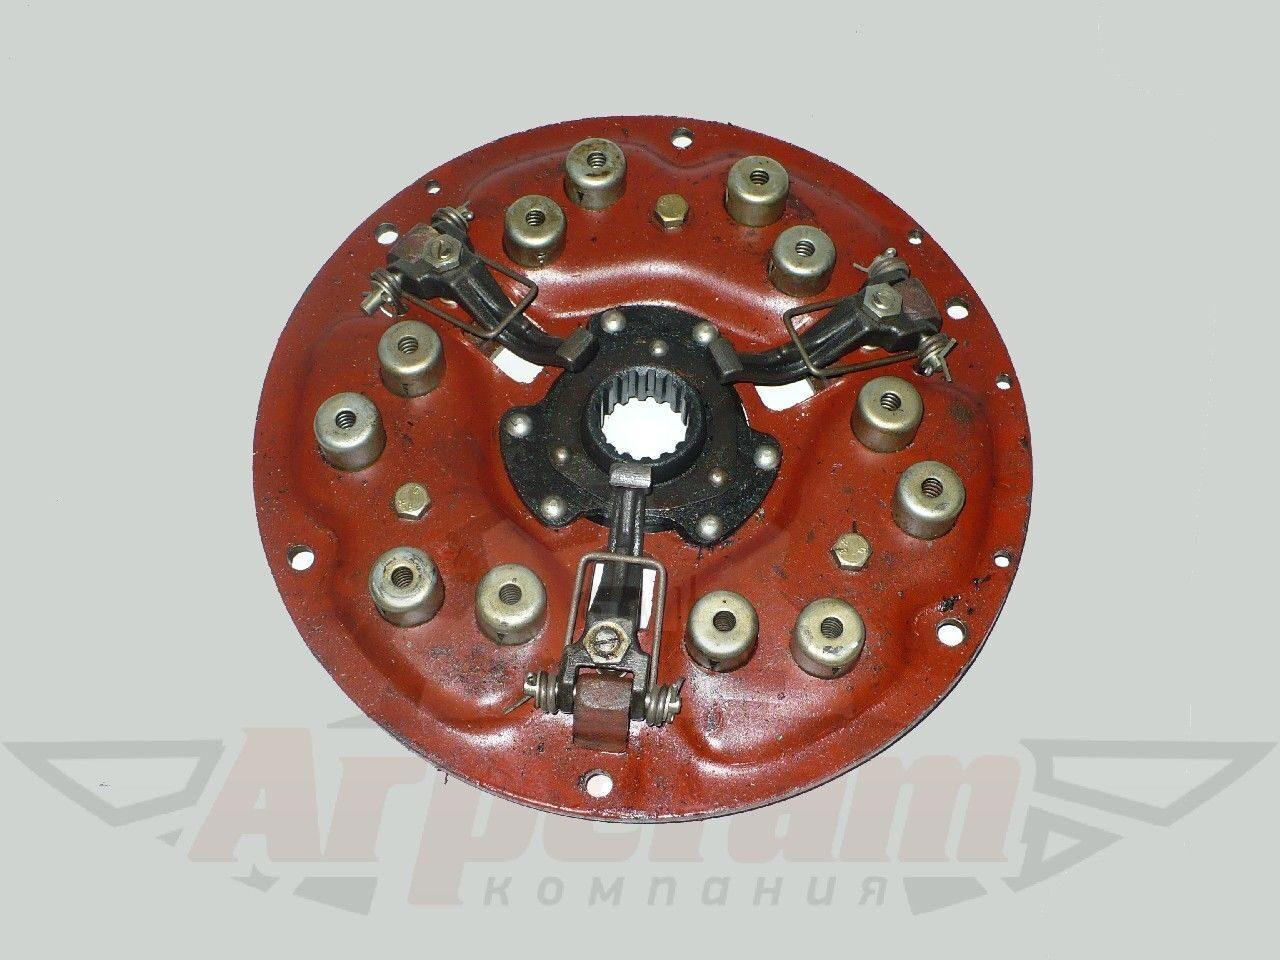 Автоспецтехника: Сцепление трактора МТЗ-80/82